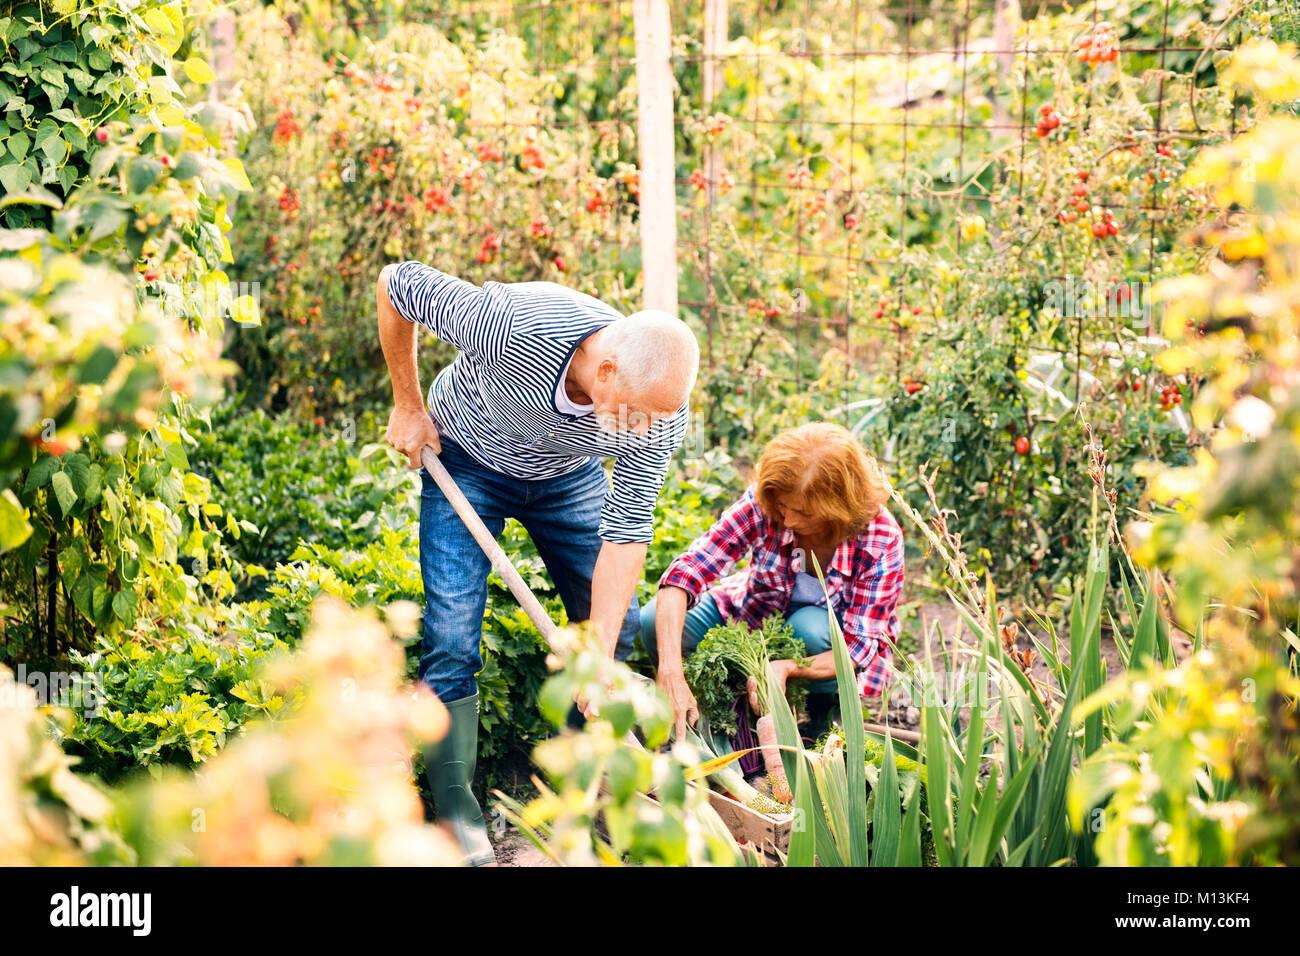 Senior couple gardening in the backyard garden. - Stock Image